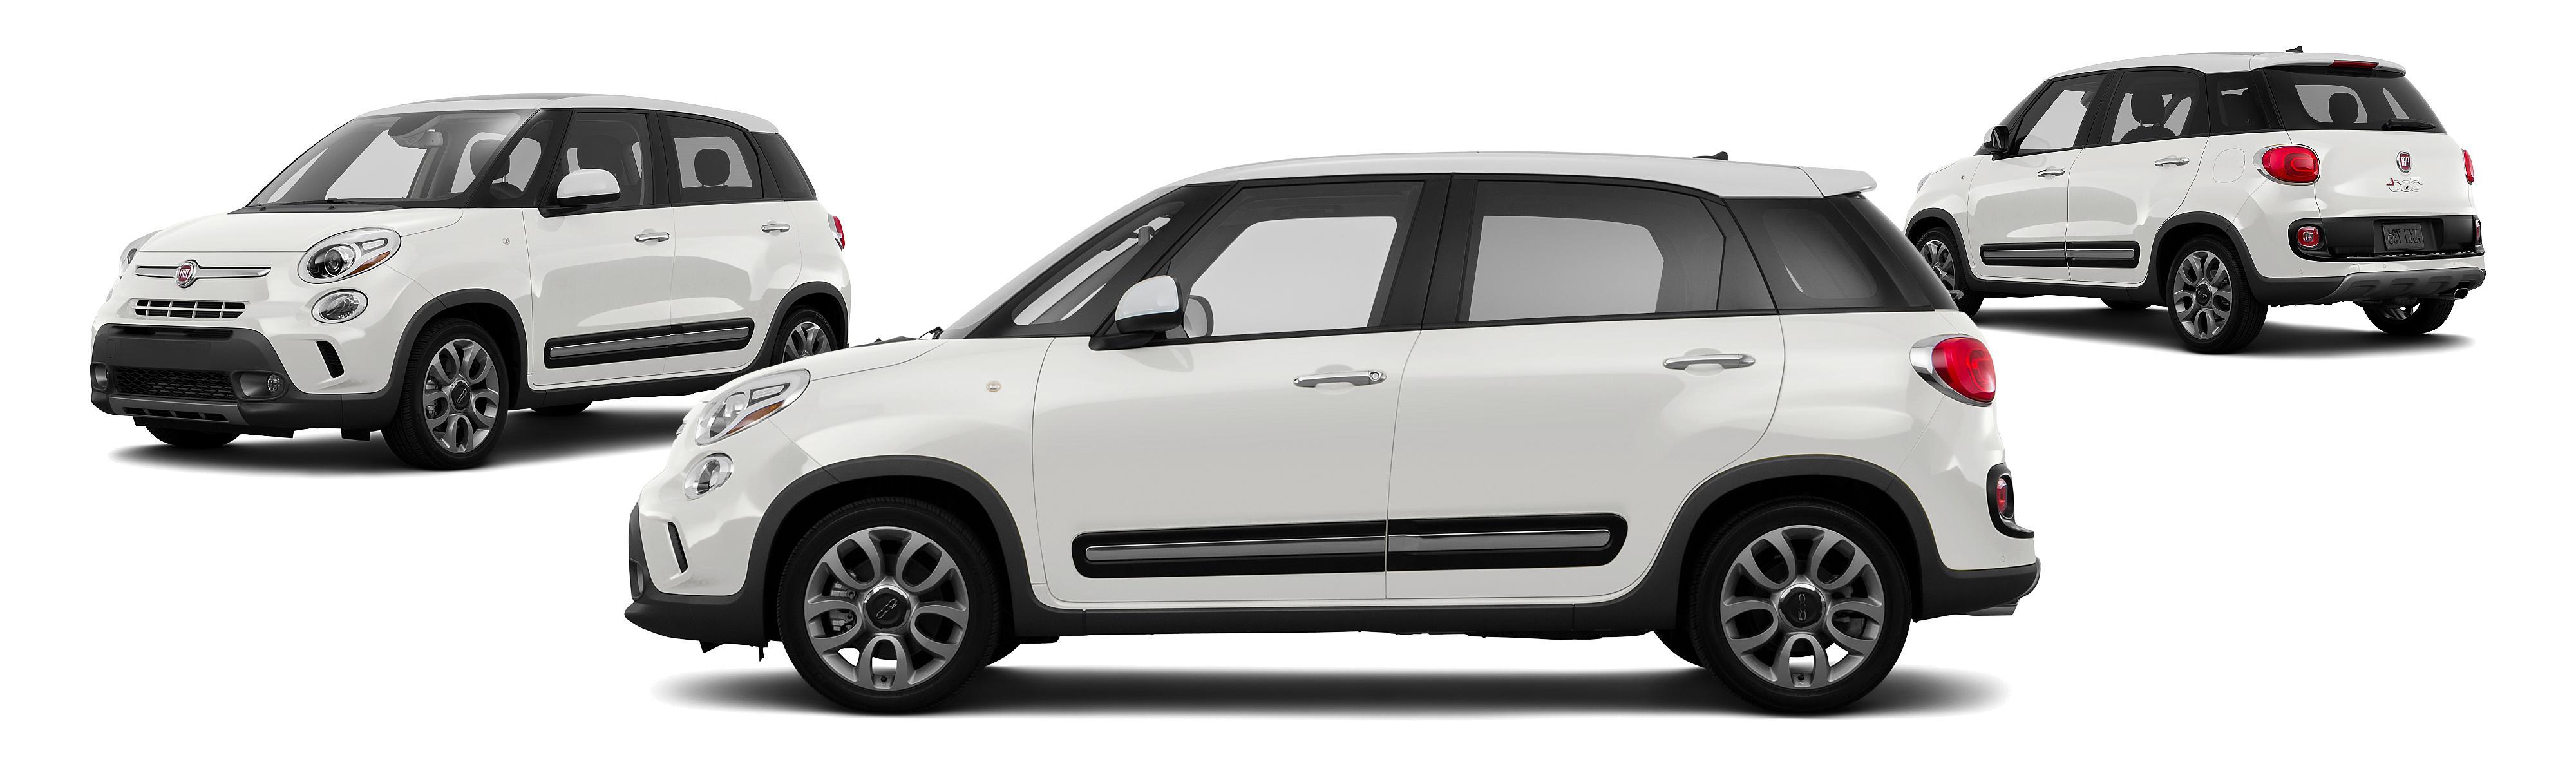 Fresh Fiat Suv 2015